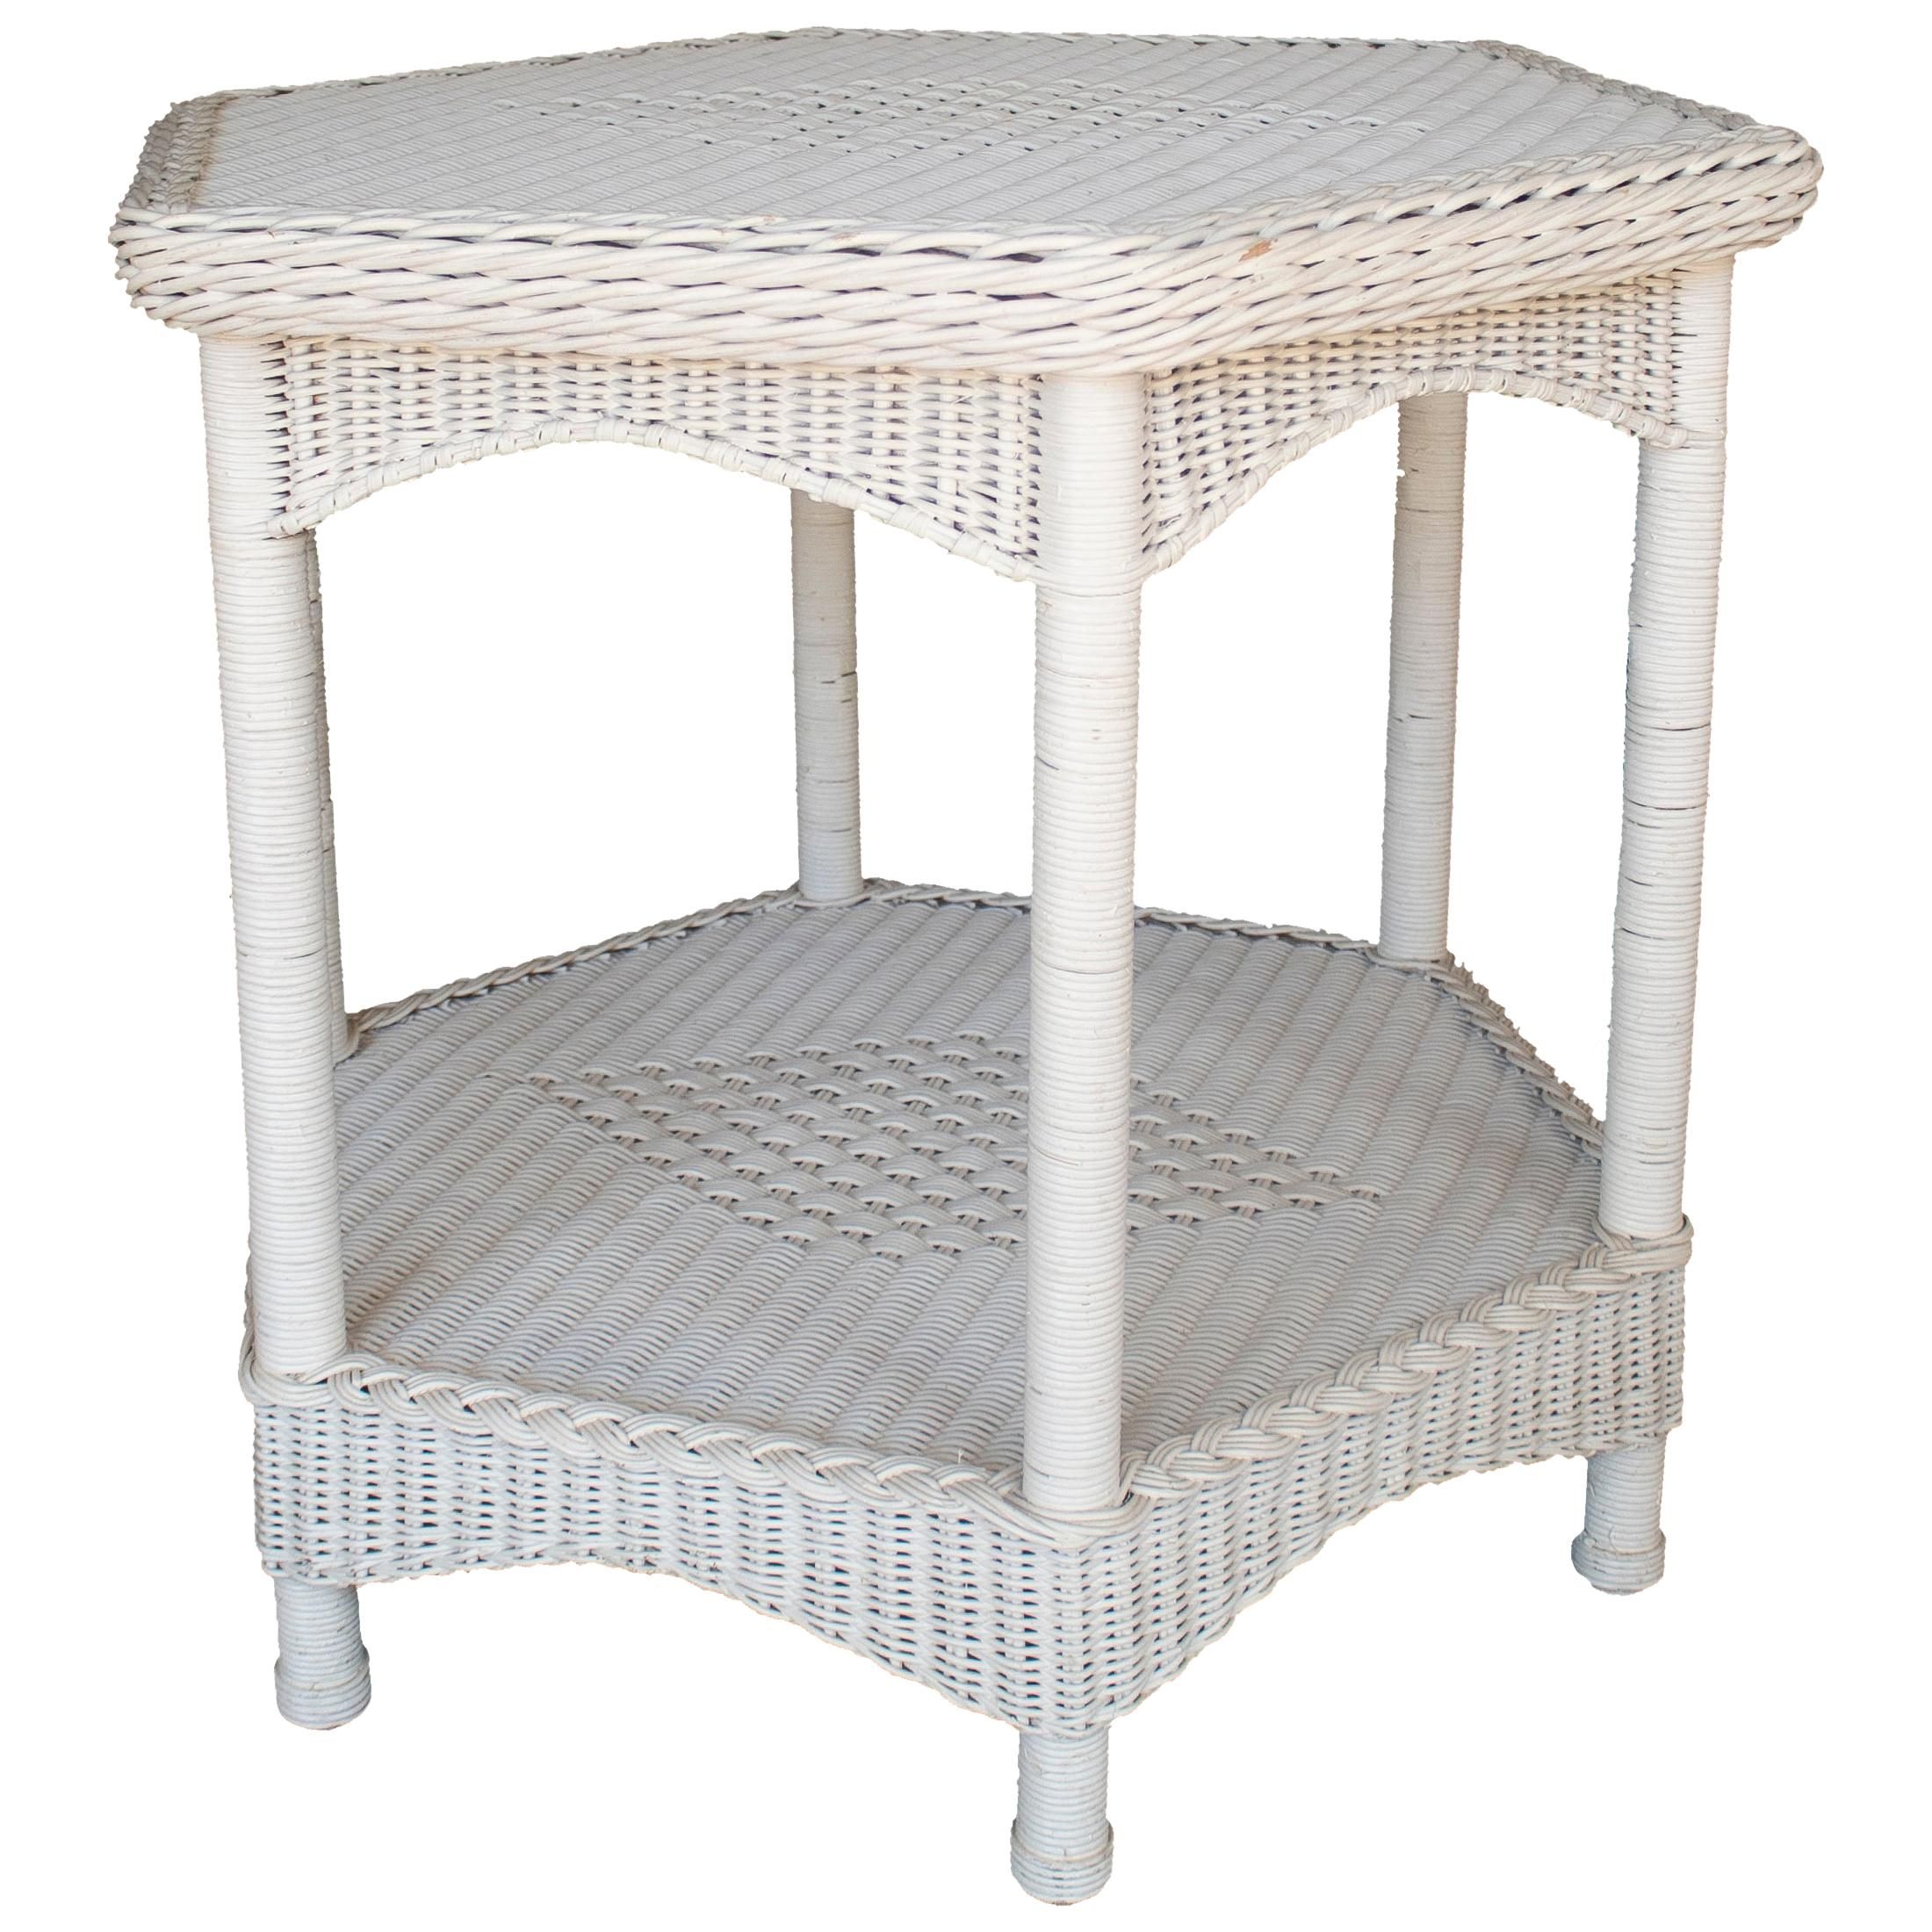 1970s Spanish White Octagonal Wicker Side Table